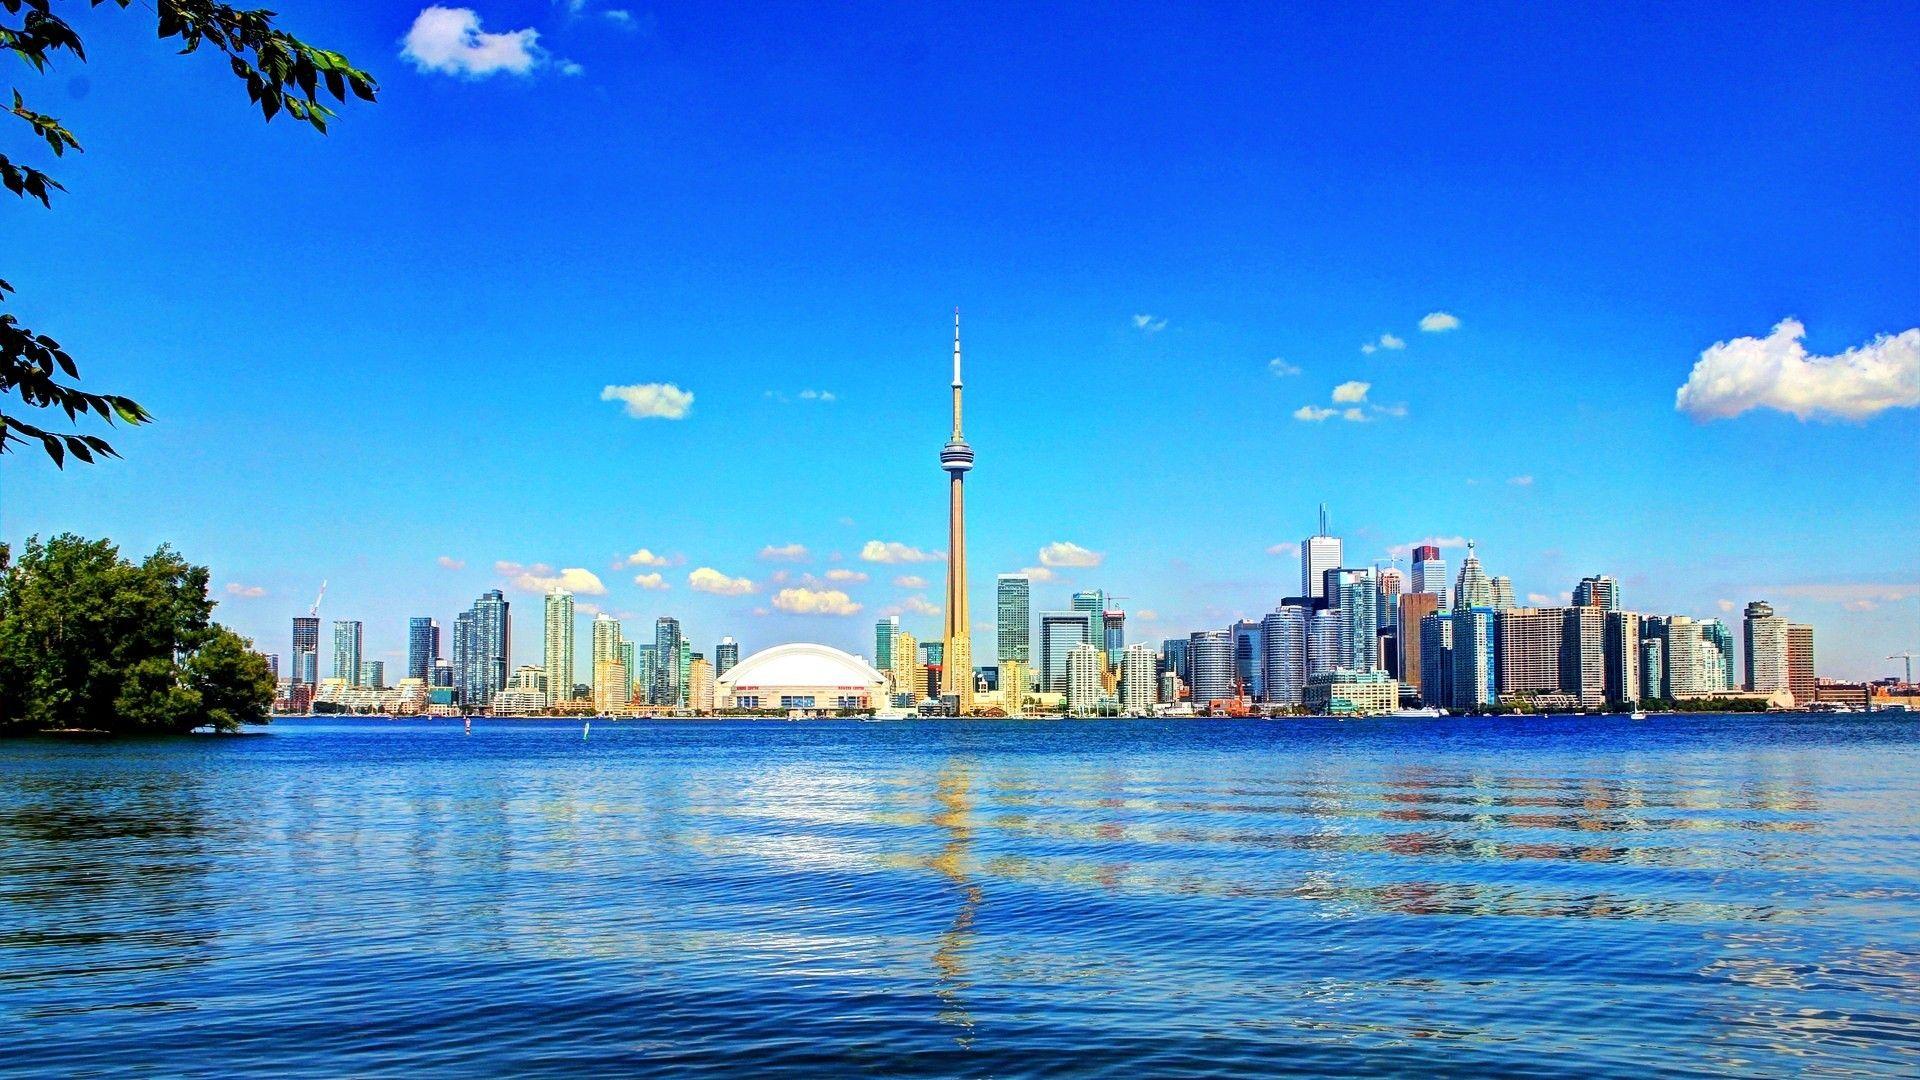 Toronto wallpaper background